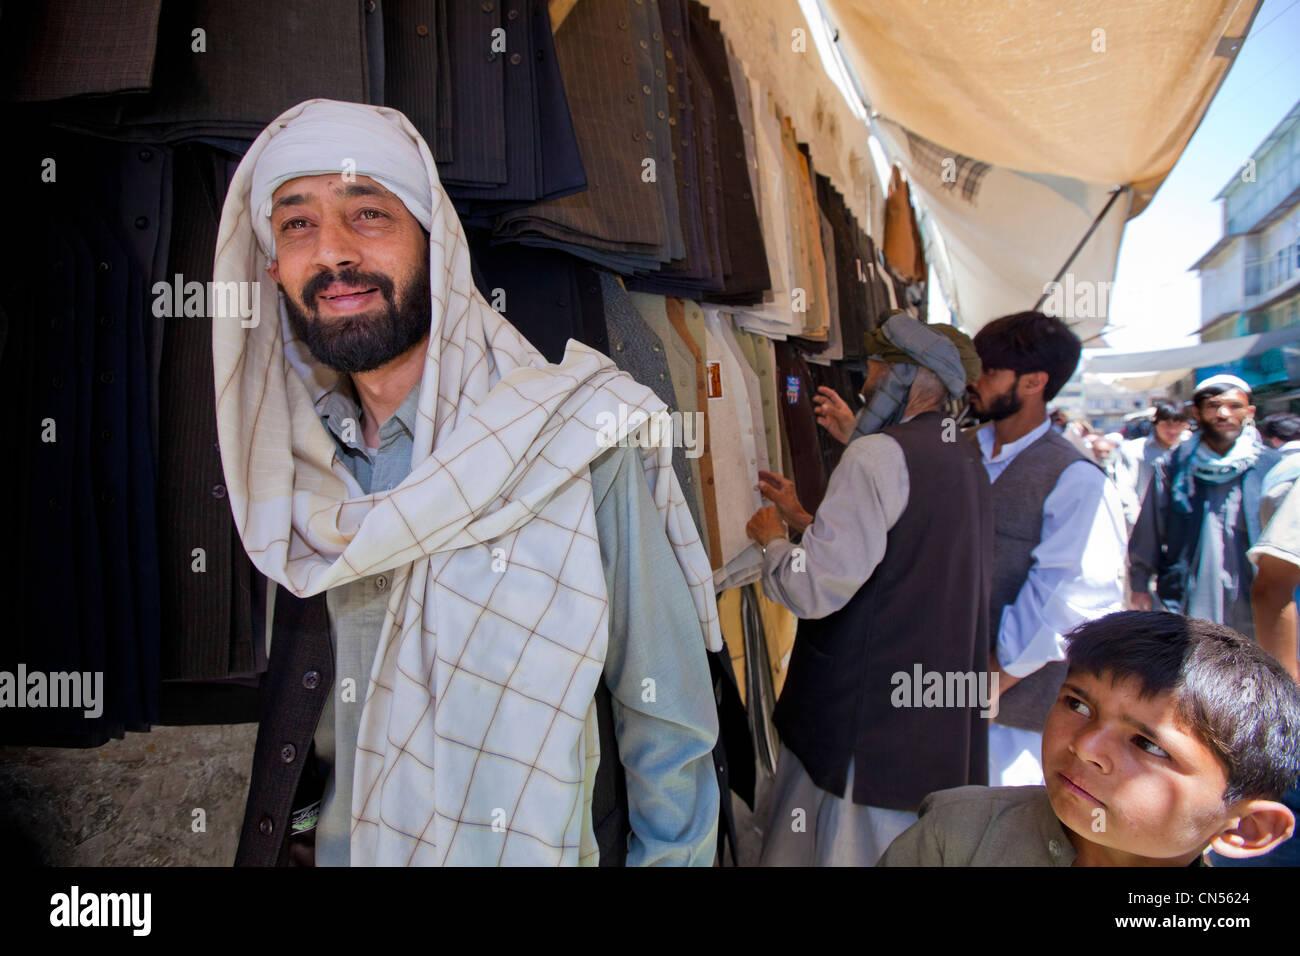 Afghanistan, Kabul, Chahari Sadarat, clothes seller - Stock Image